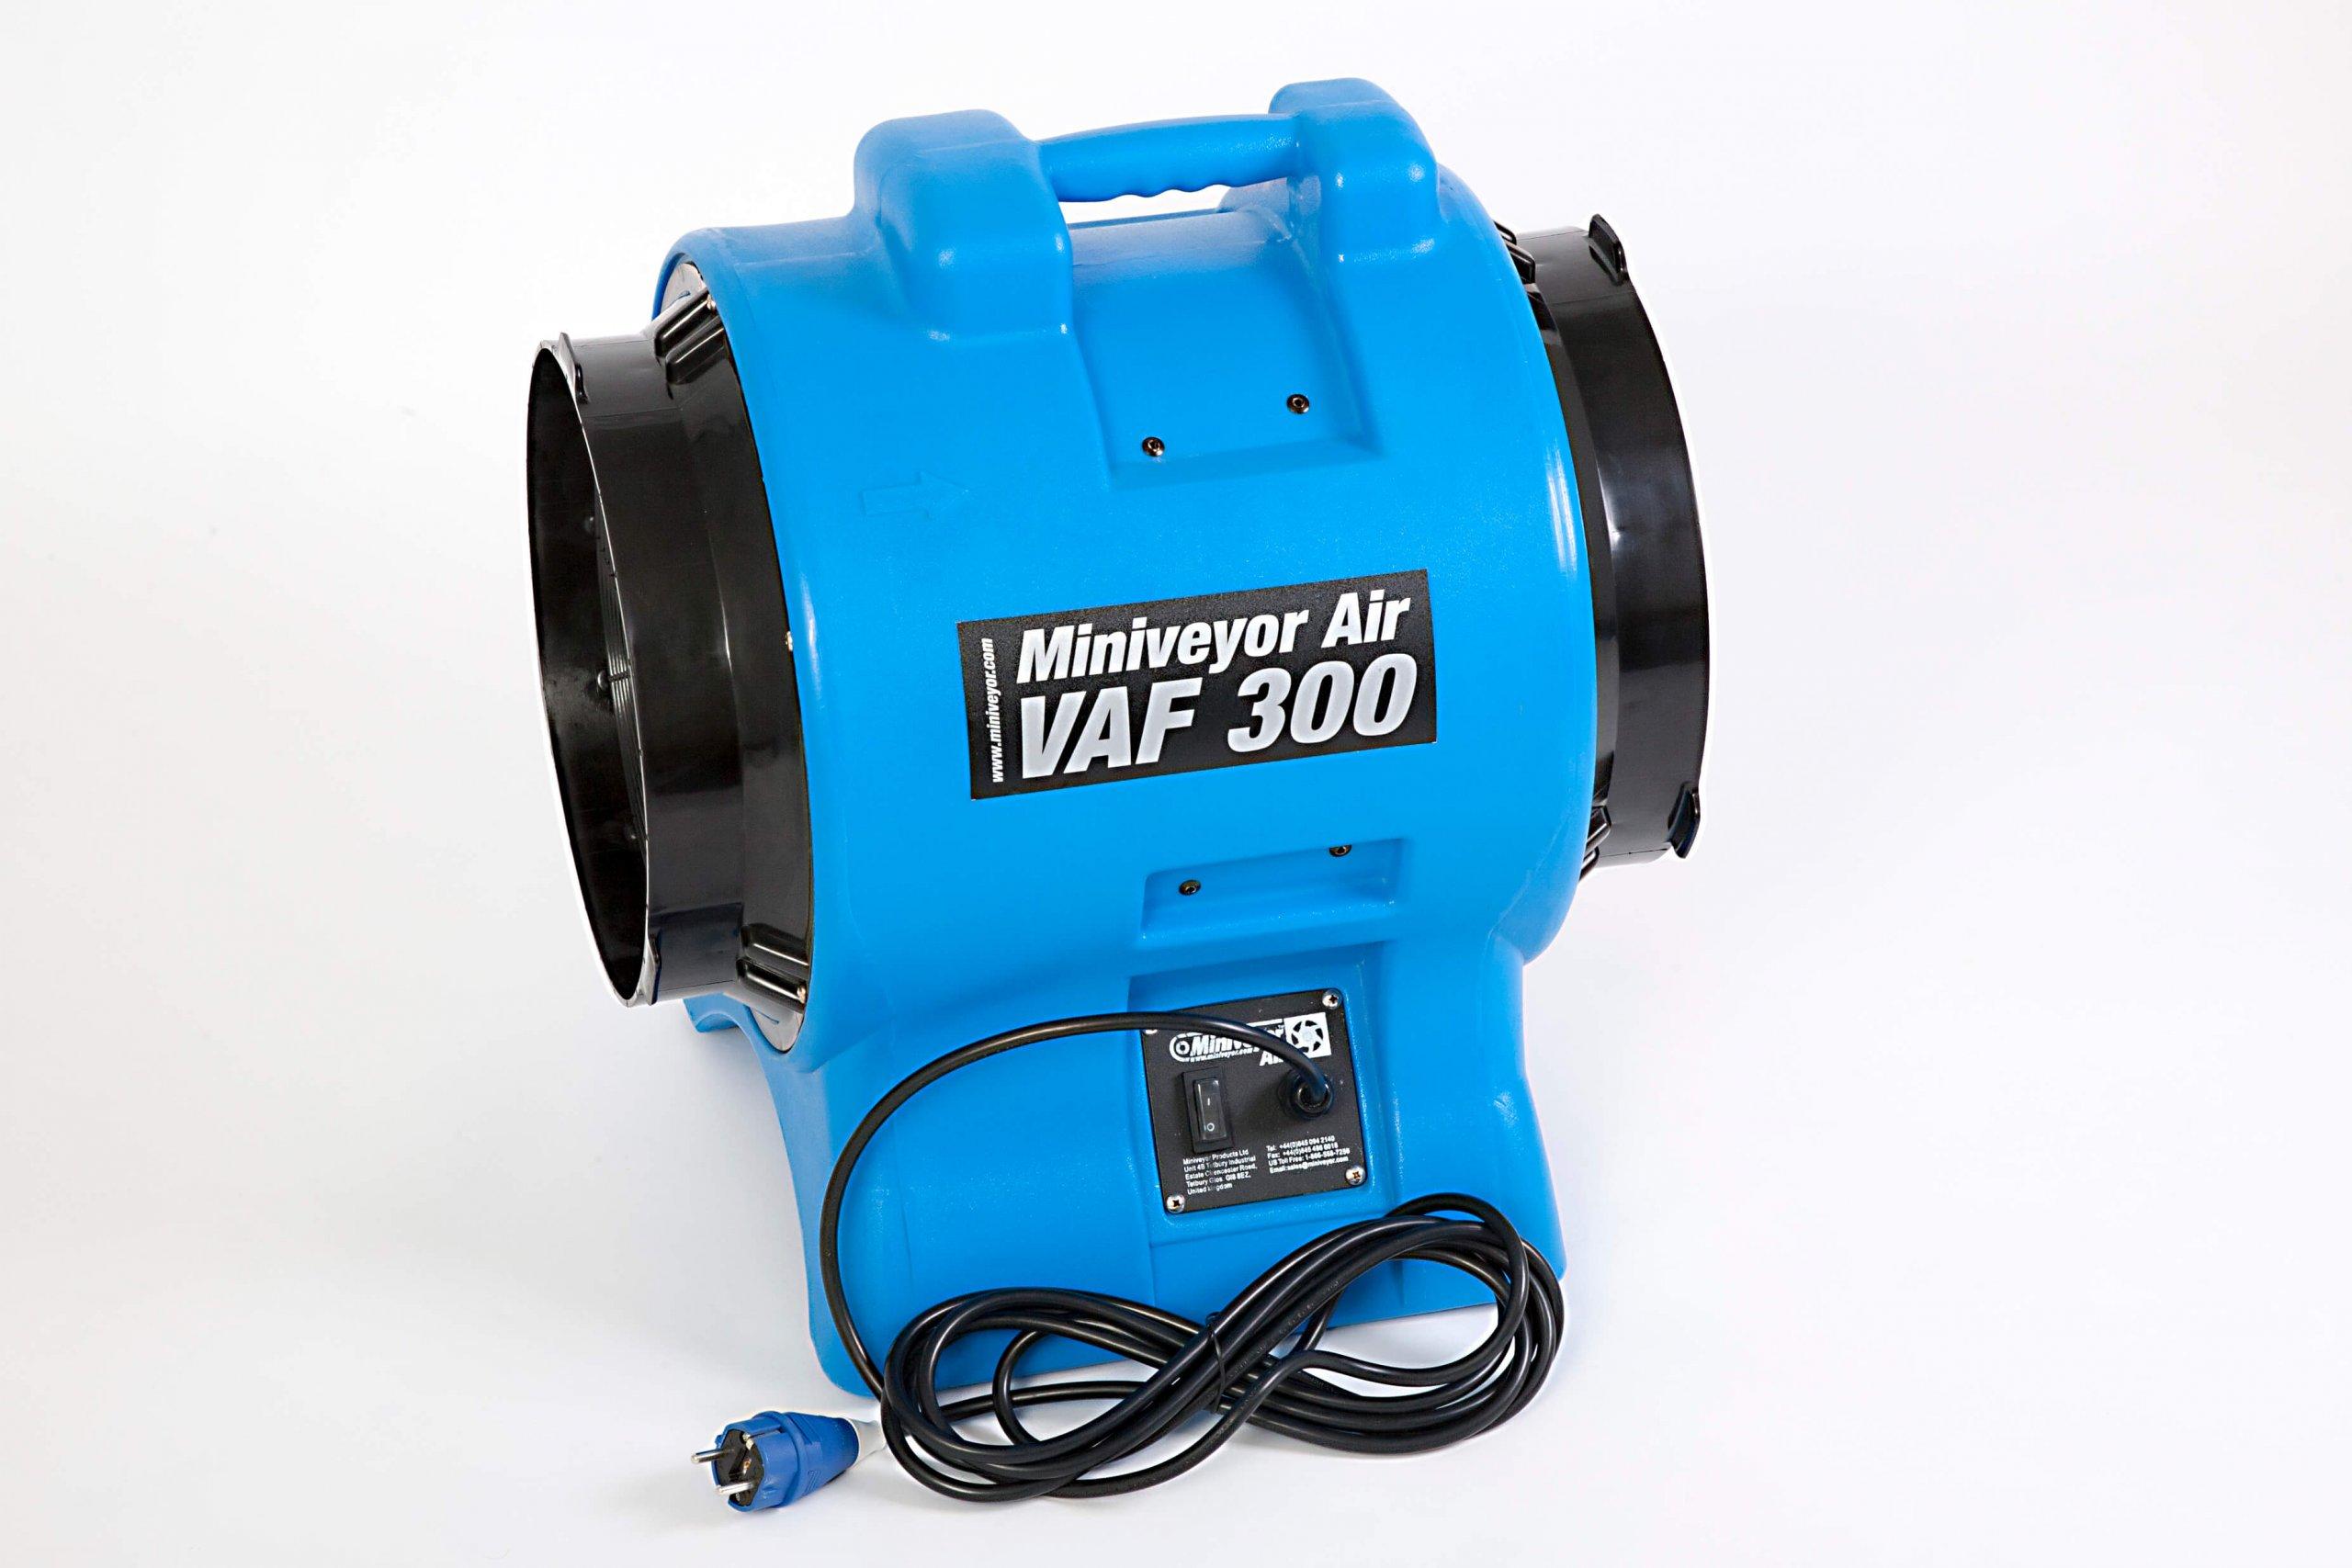 Miniveyor Air VAF-300